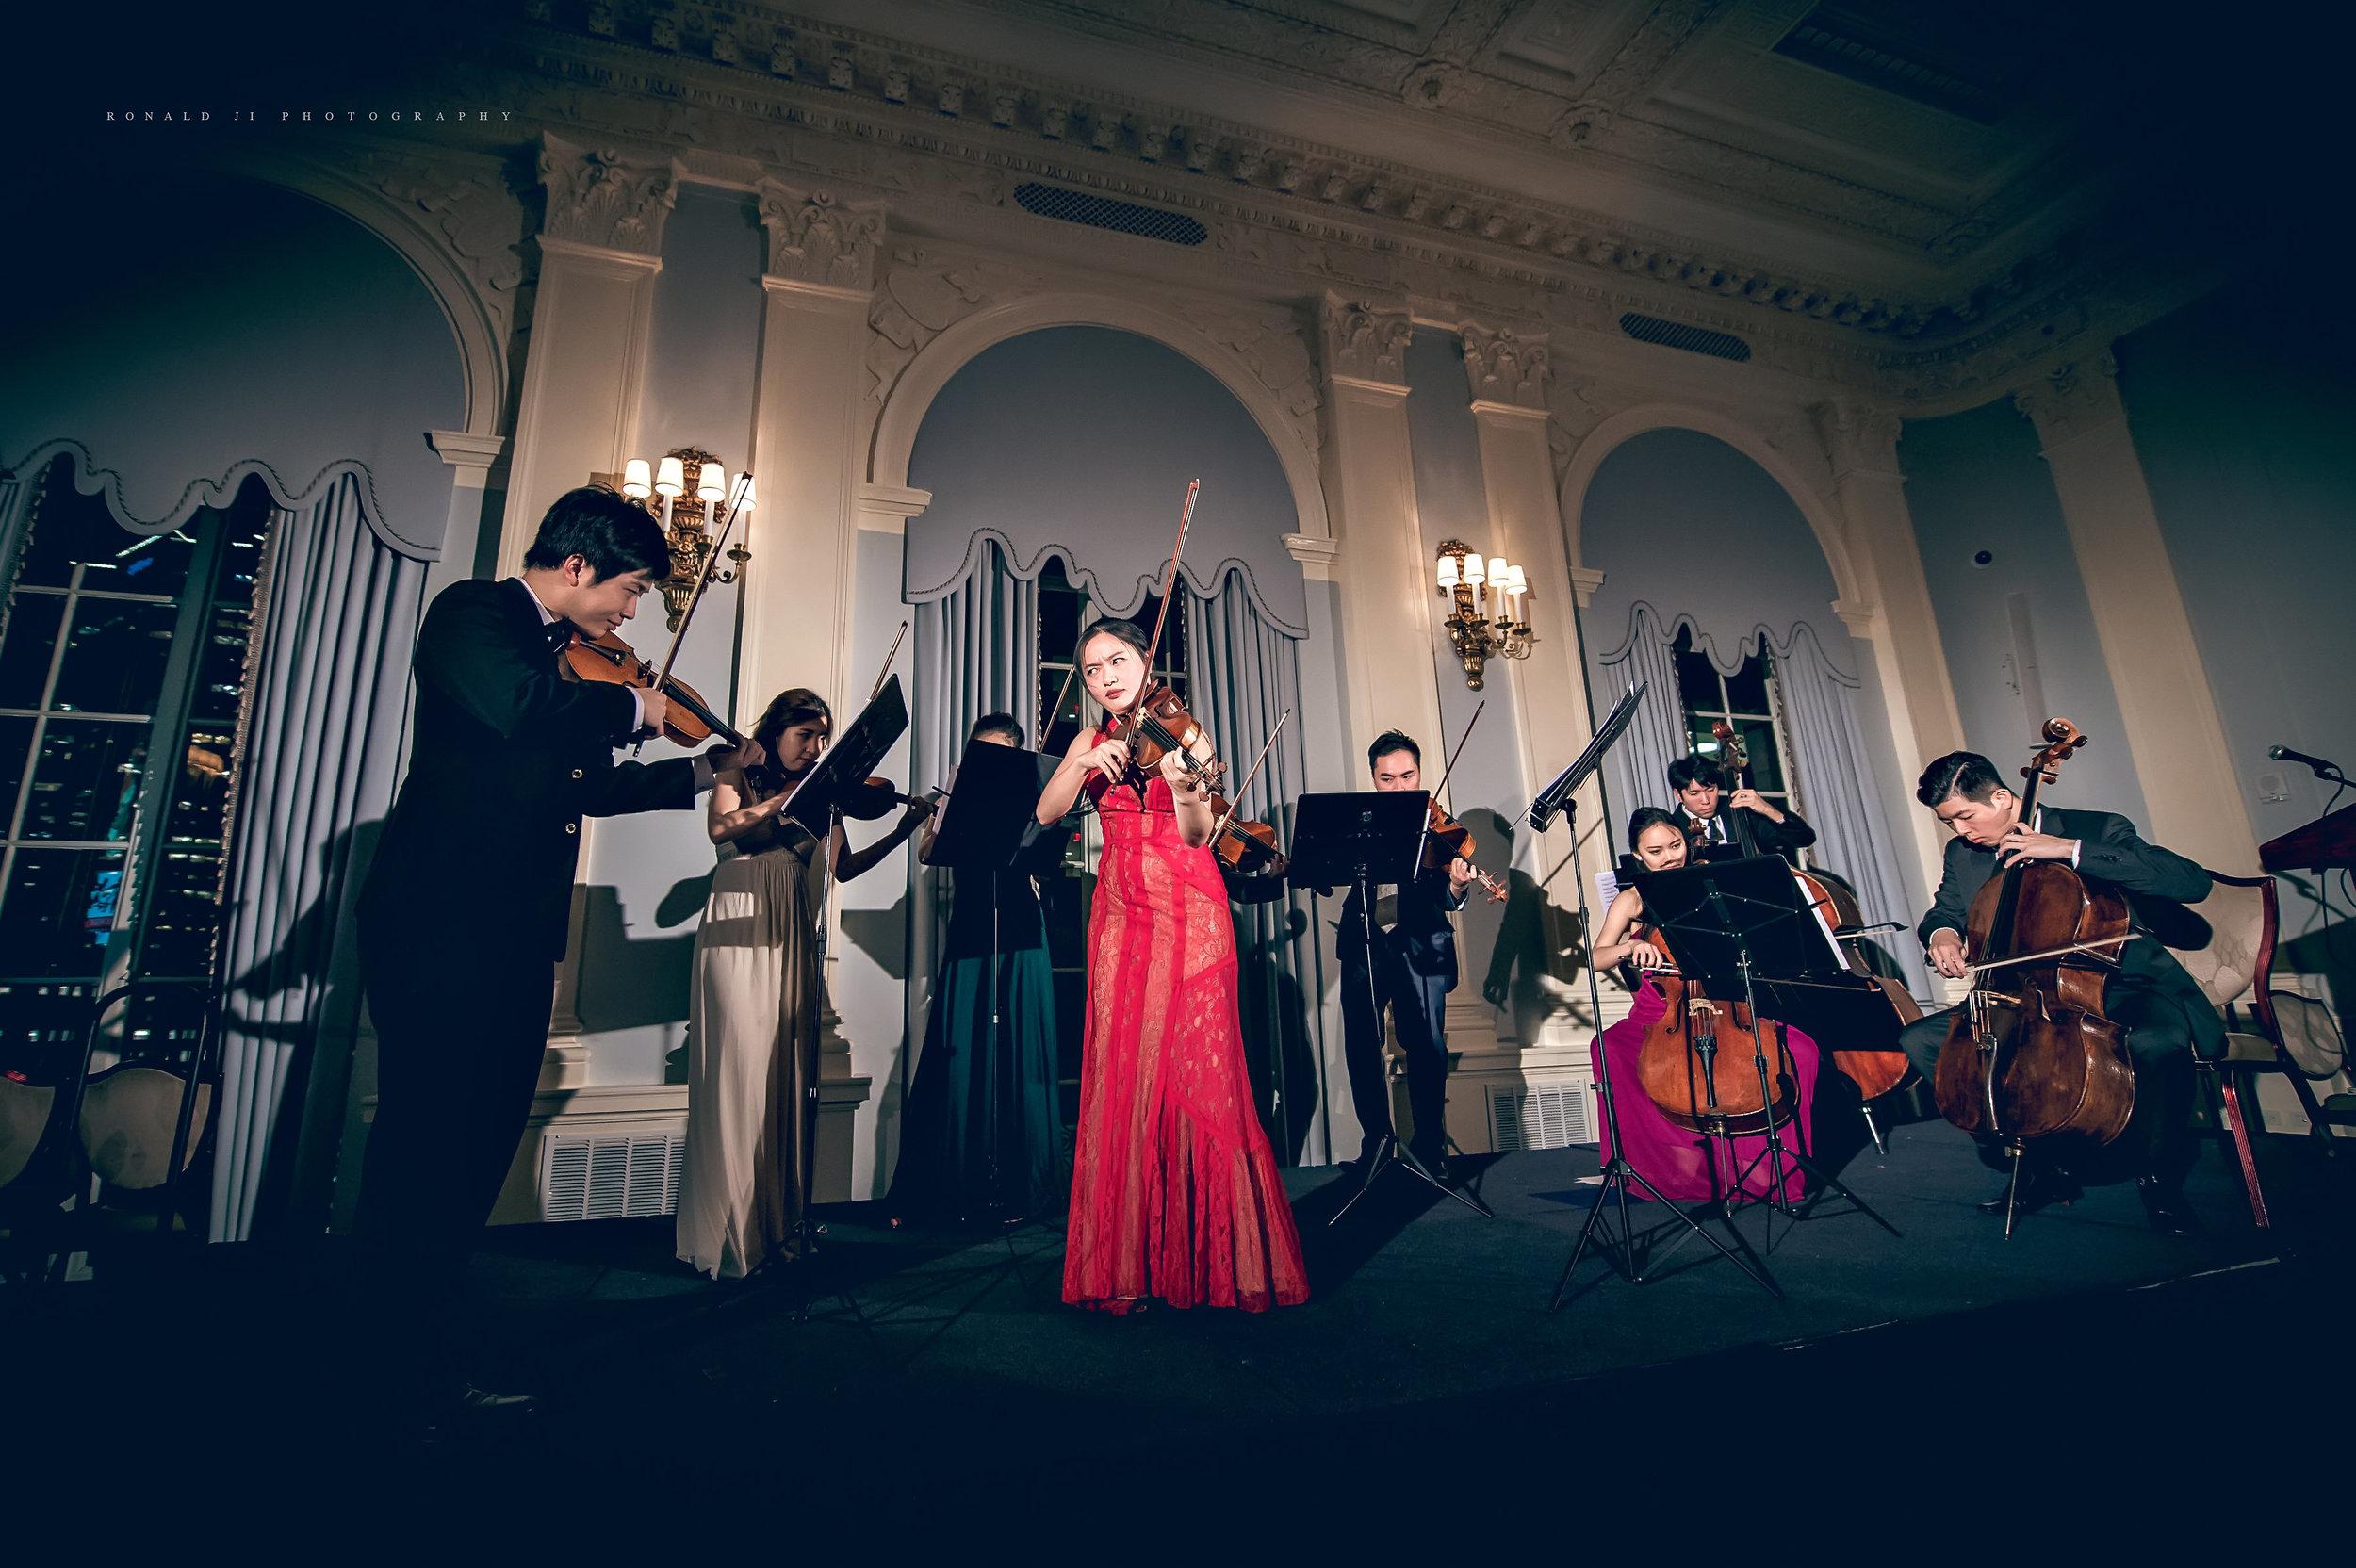 Vivaldi Winter at New Asia Chamber Music Society's Annual Gala in 2016 (photo by Ronald Ji & Ashley Chui)